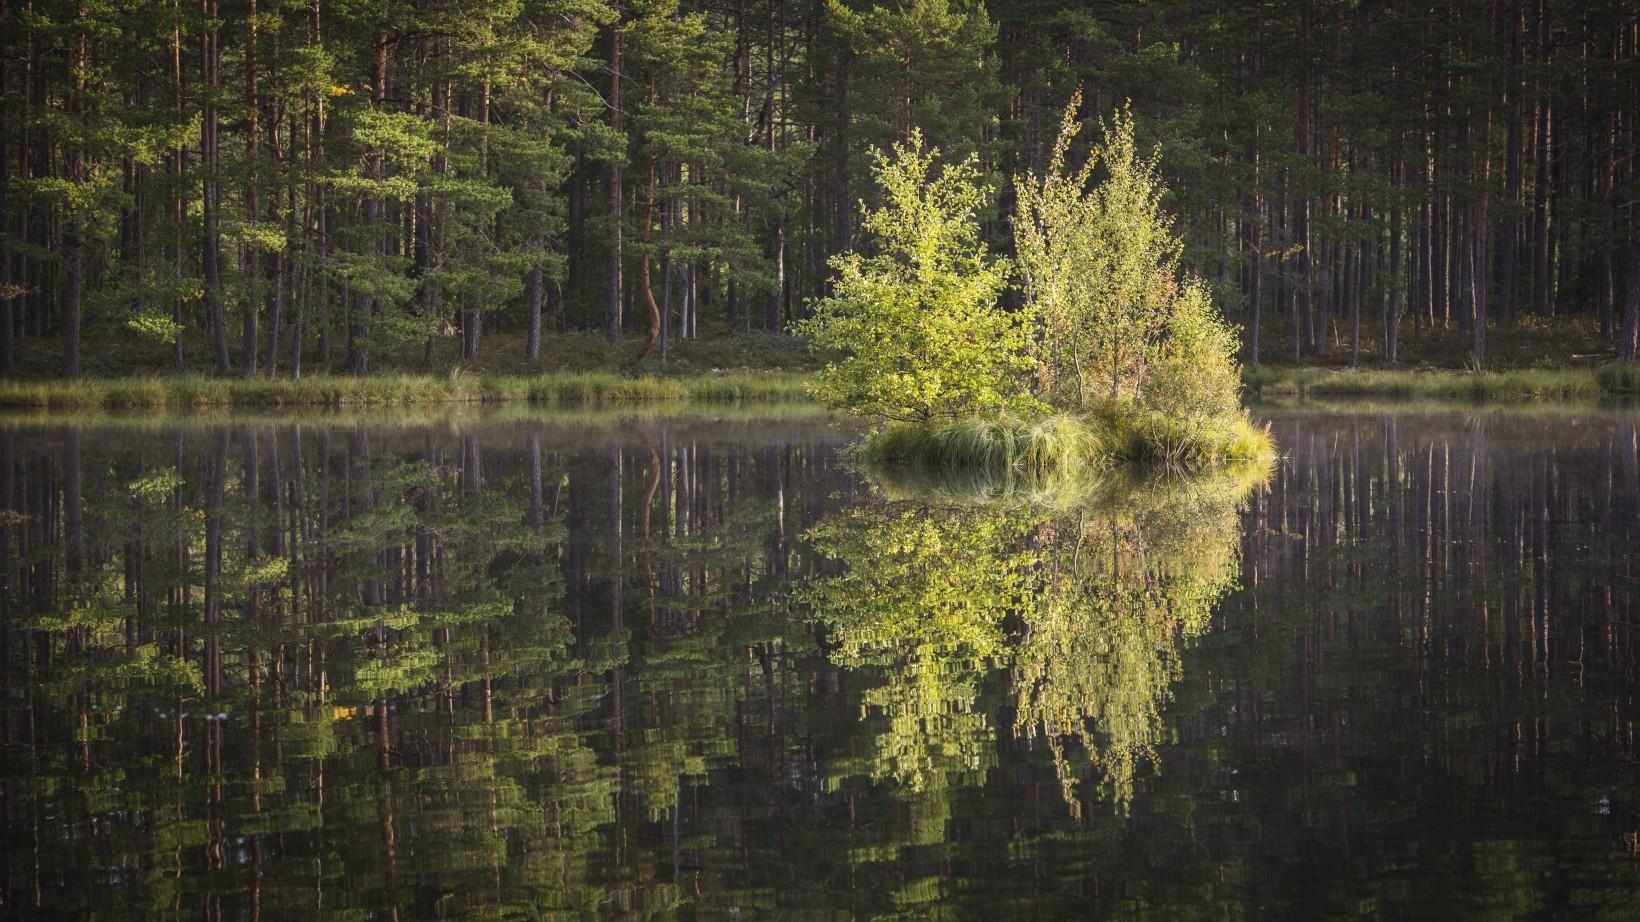 JAN_1804_JesperAnderssonPhotography